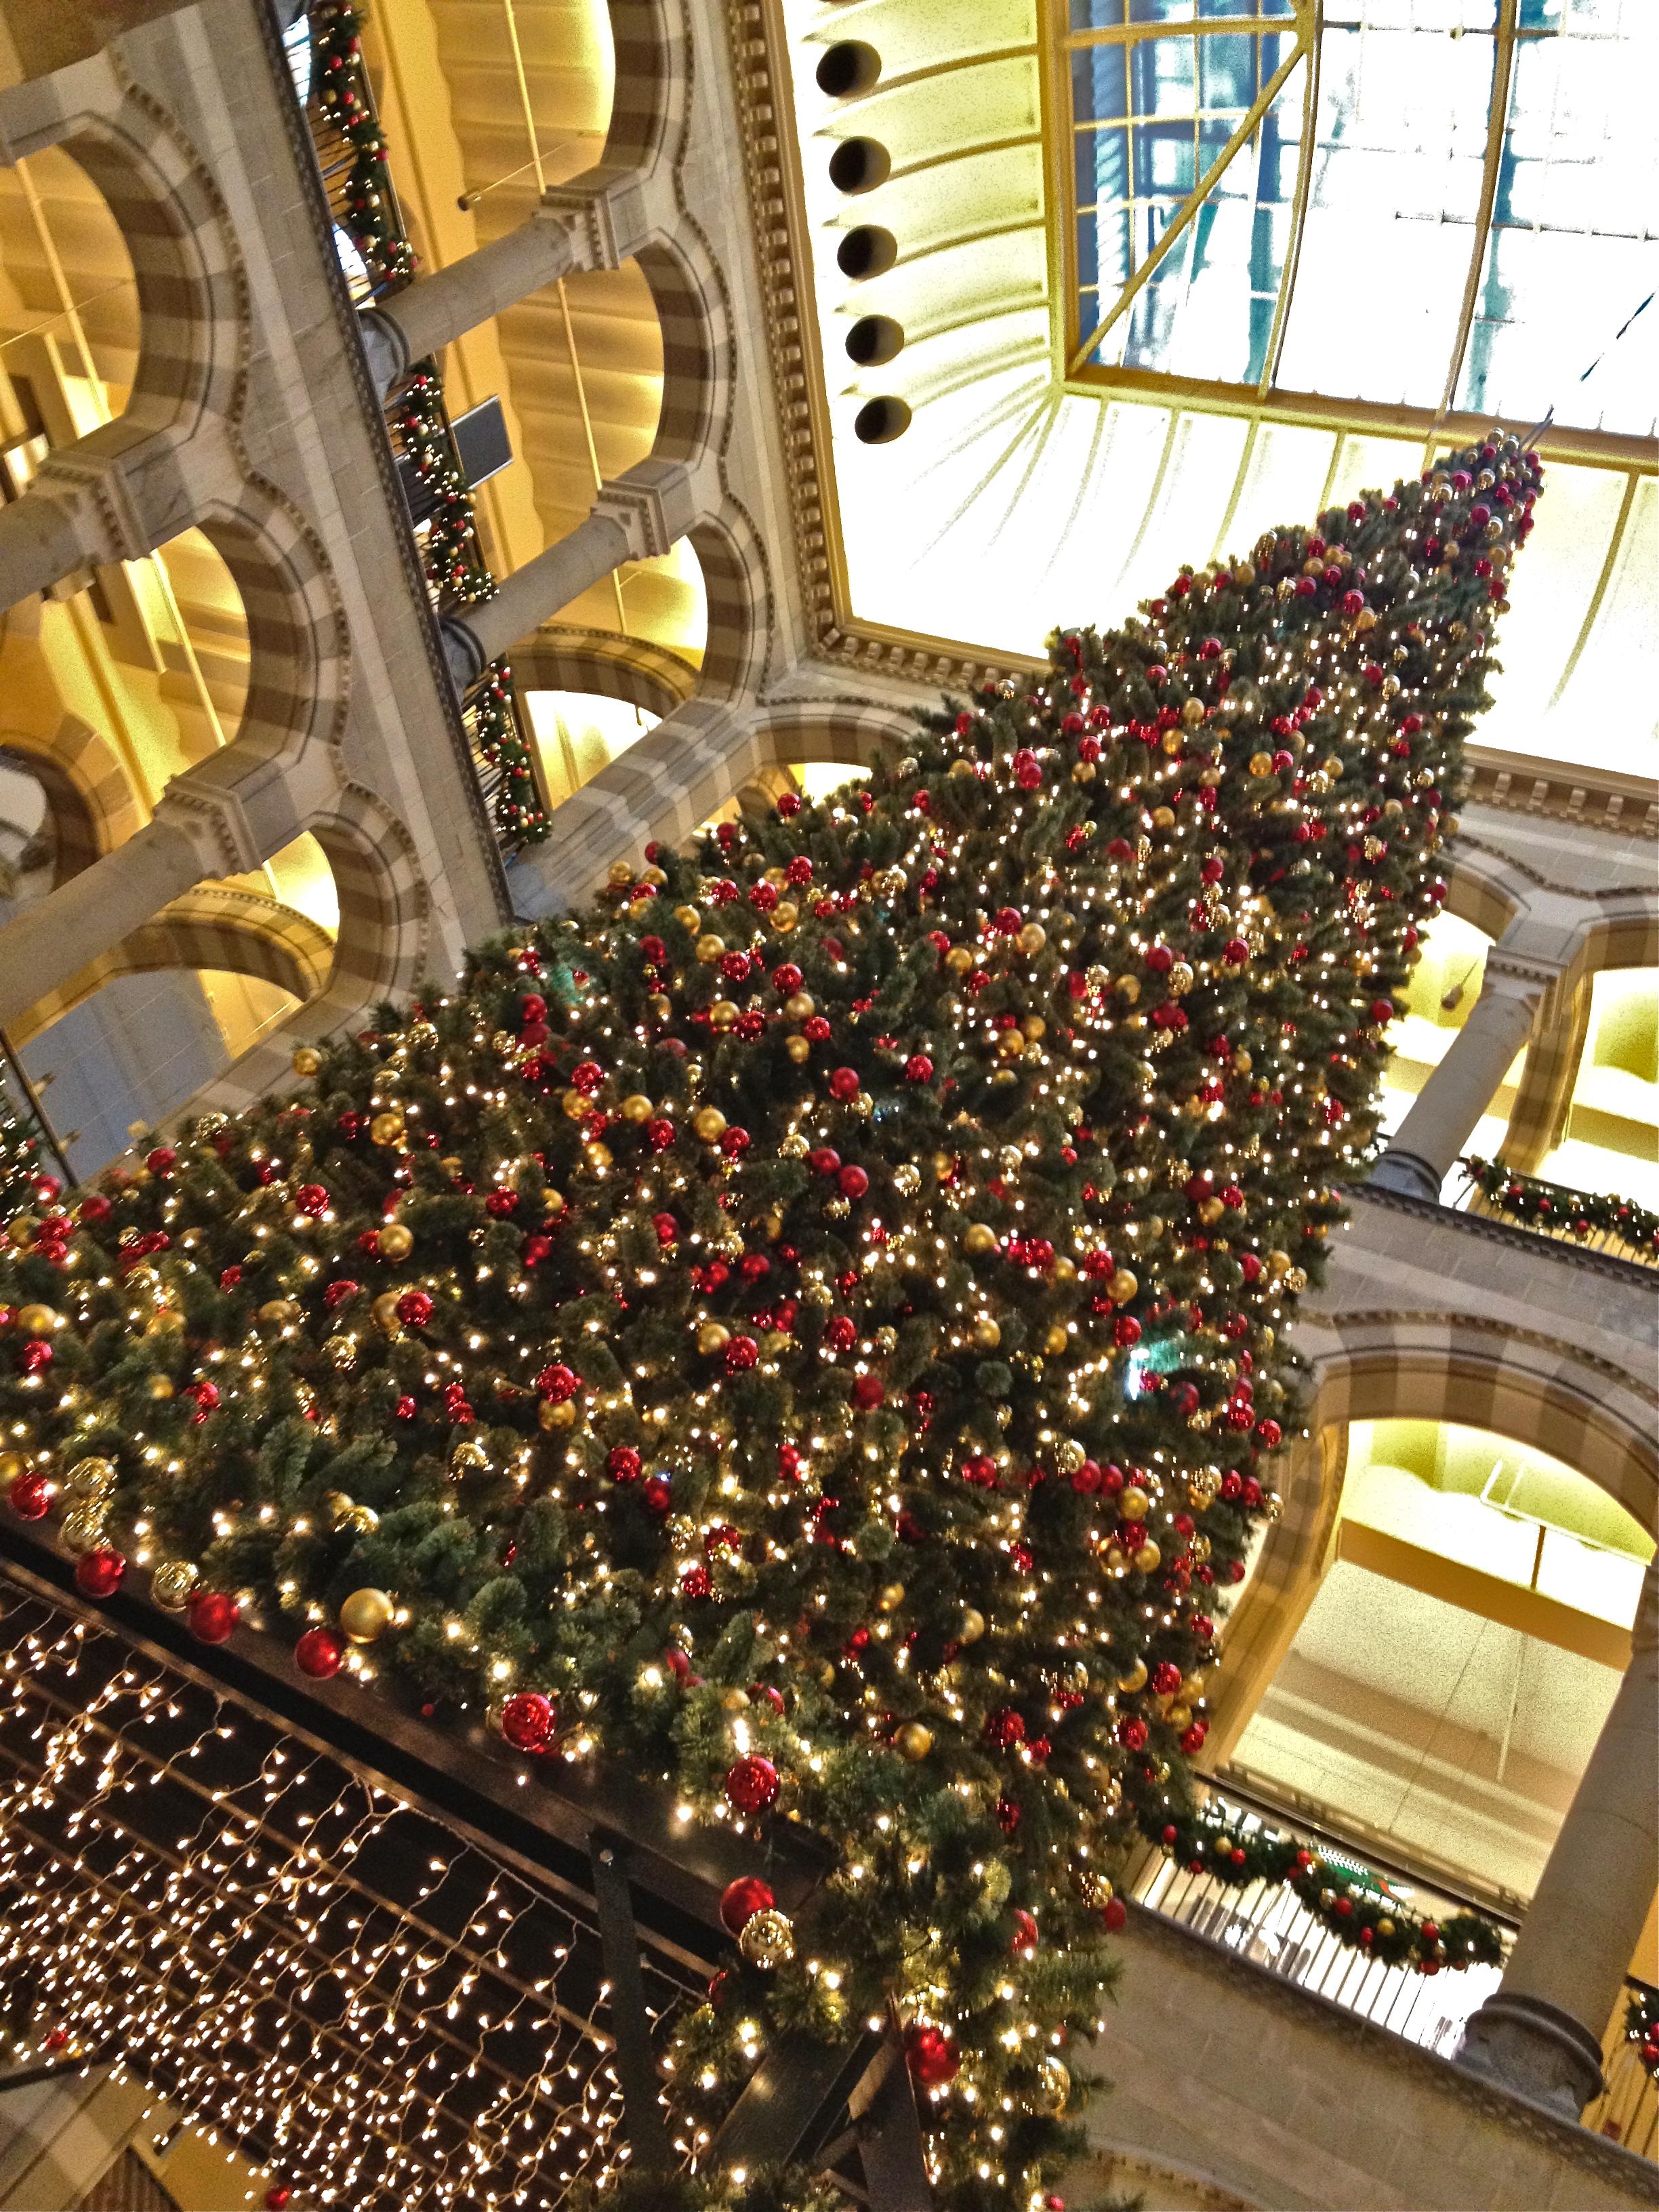 httpsmarkjwallisfileswordpresscom201112sh - Christmas Tree Shopping